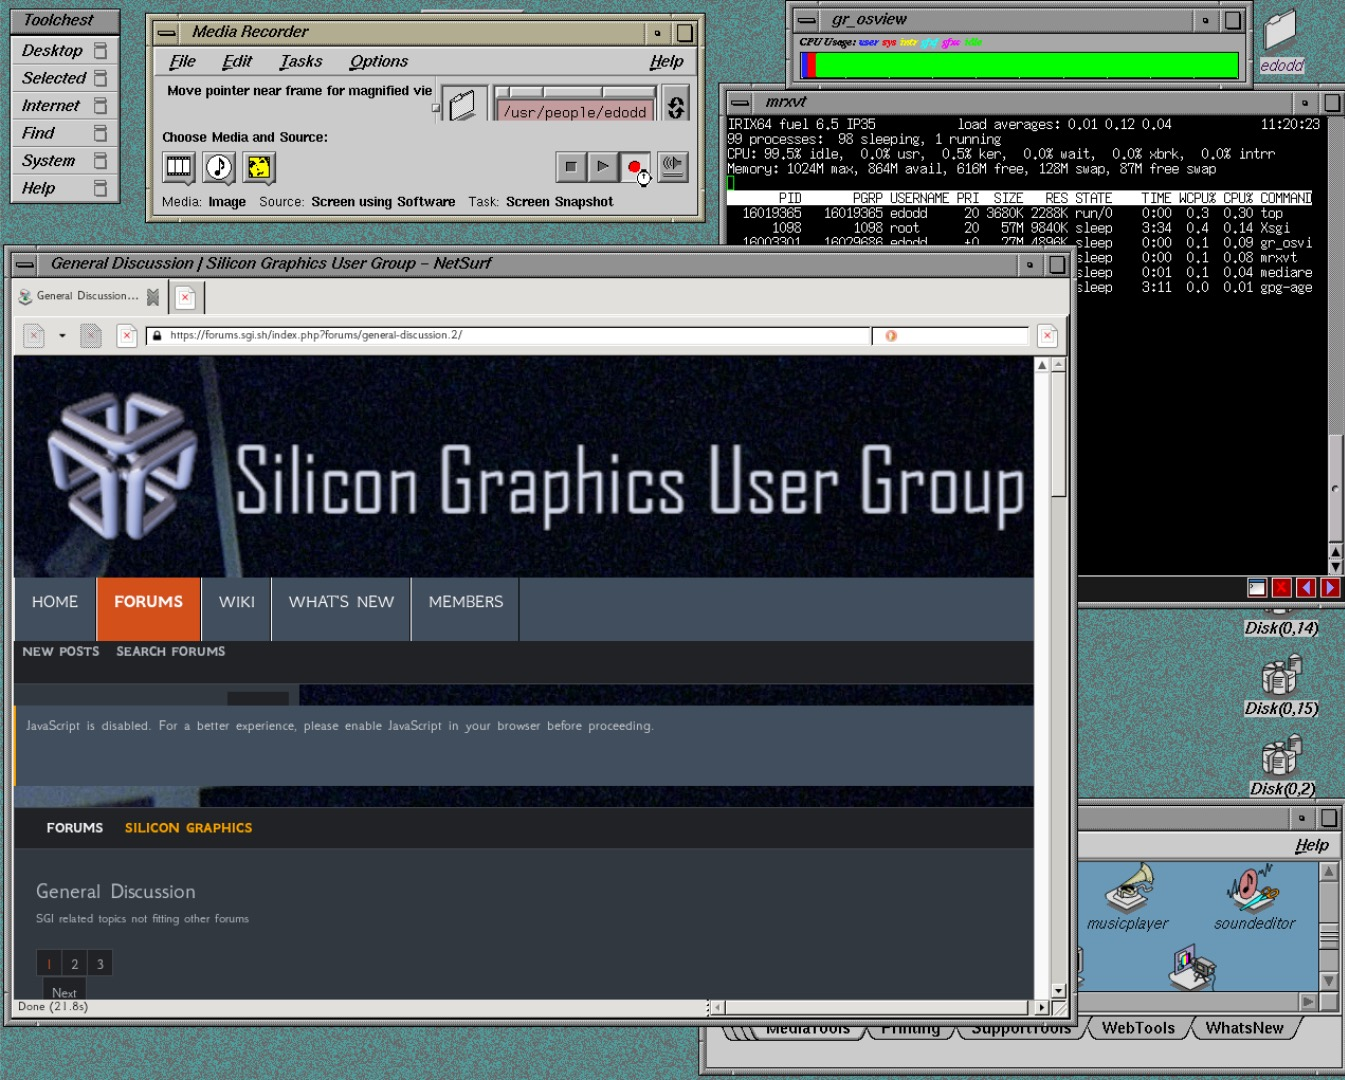 Screen Shot 2021-06-30 at 11.25.05 AM.jpg